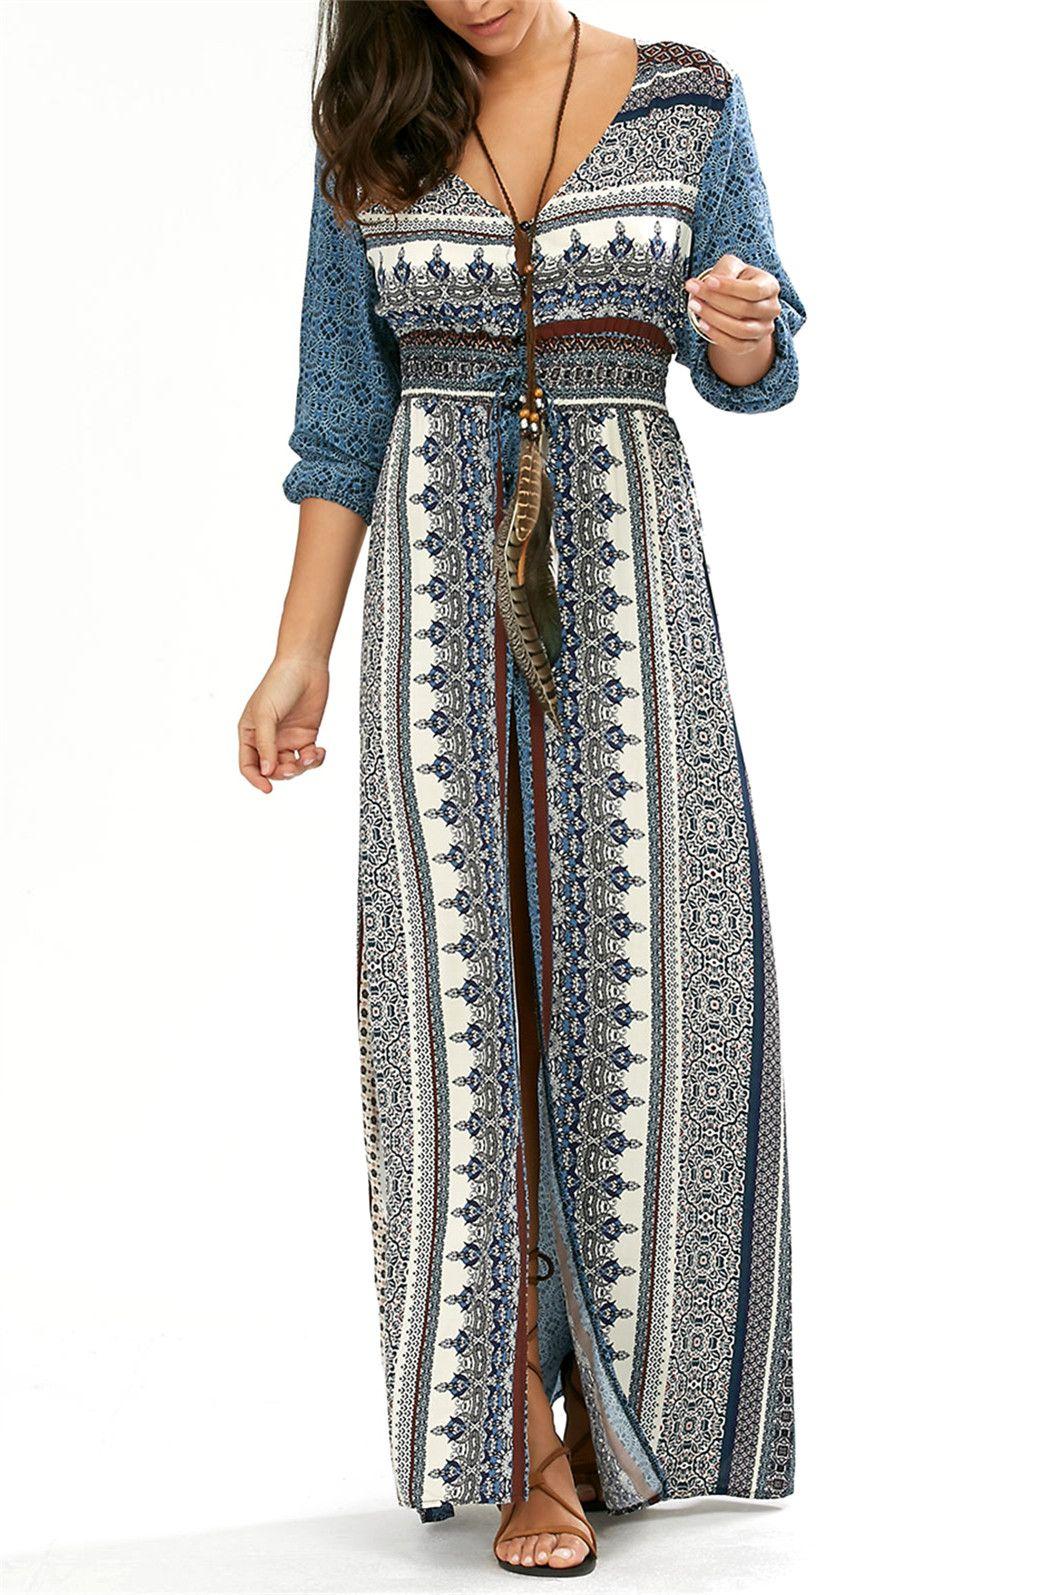 Empire Waist Button Down Flowy Beach Bohemian Maxi Dress Blue Xl